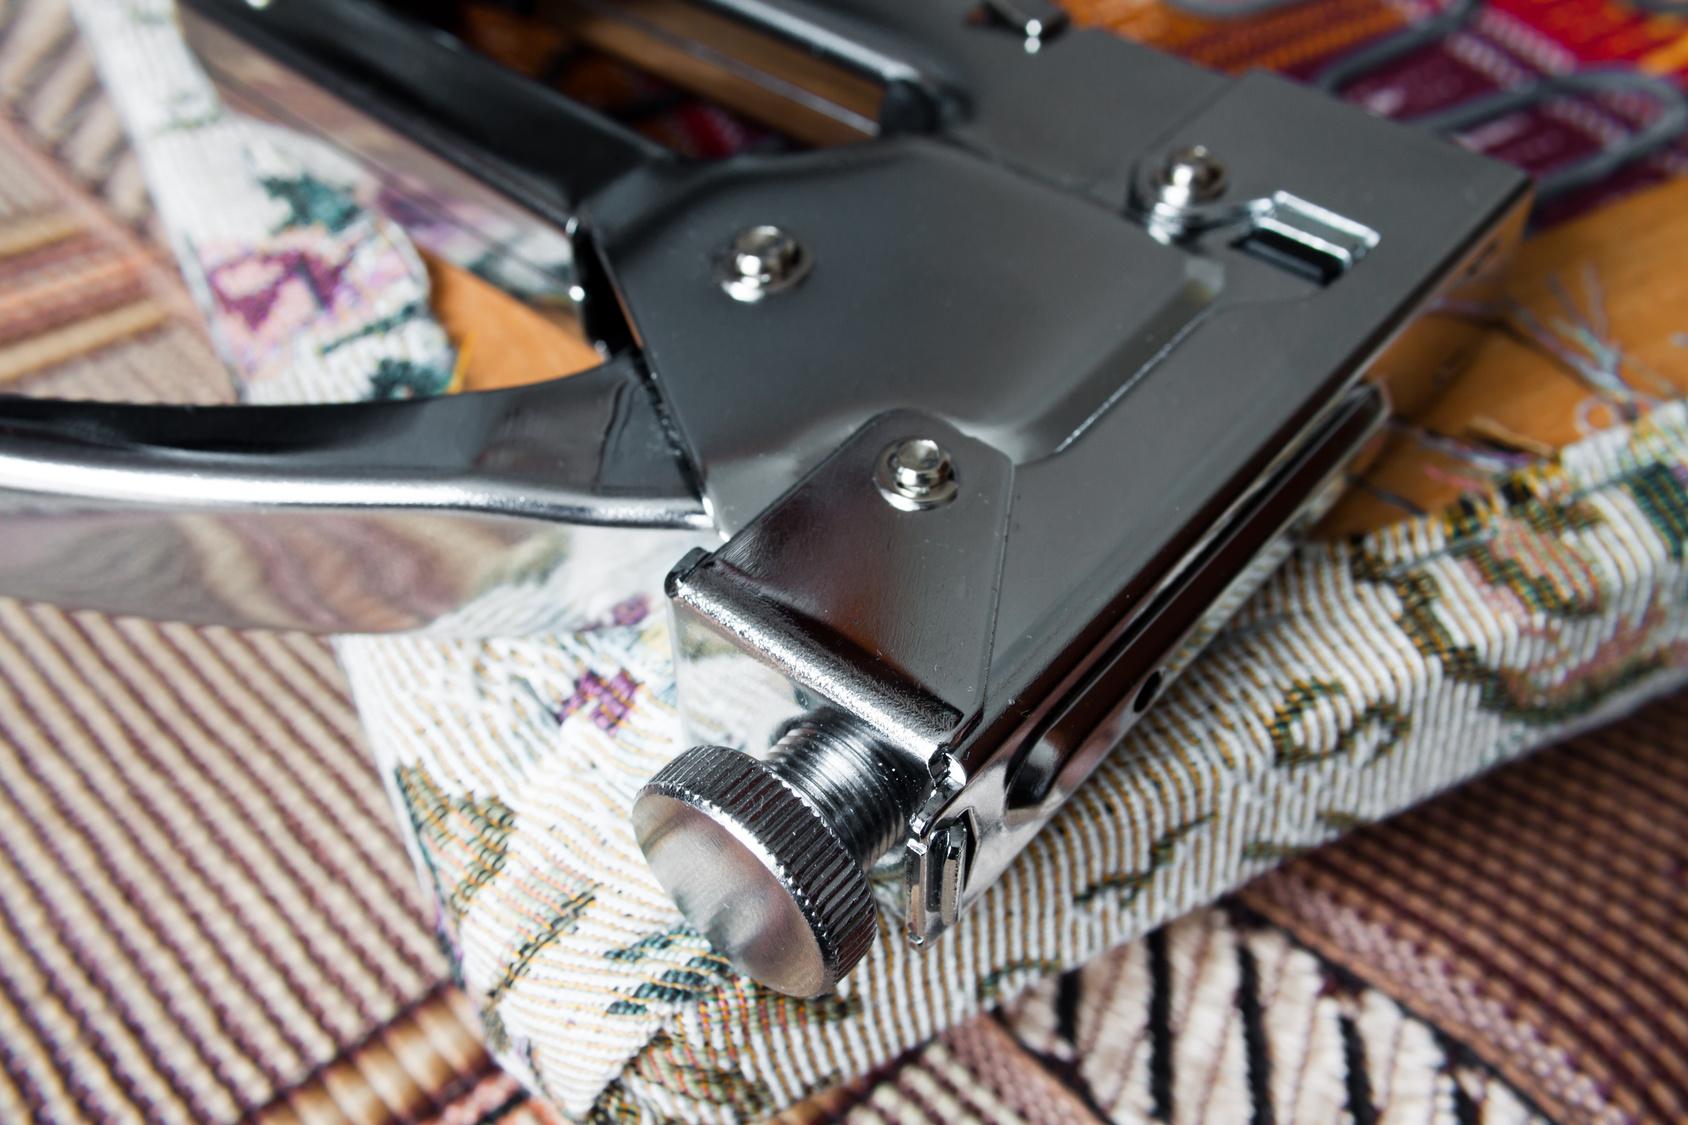 C mo tapizar sillas paso a paso vivienda saludable - Materiales para tapizar ...